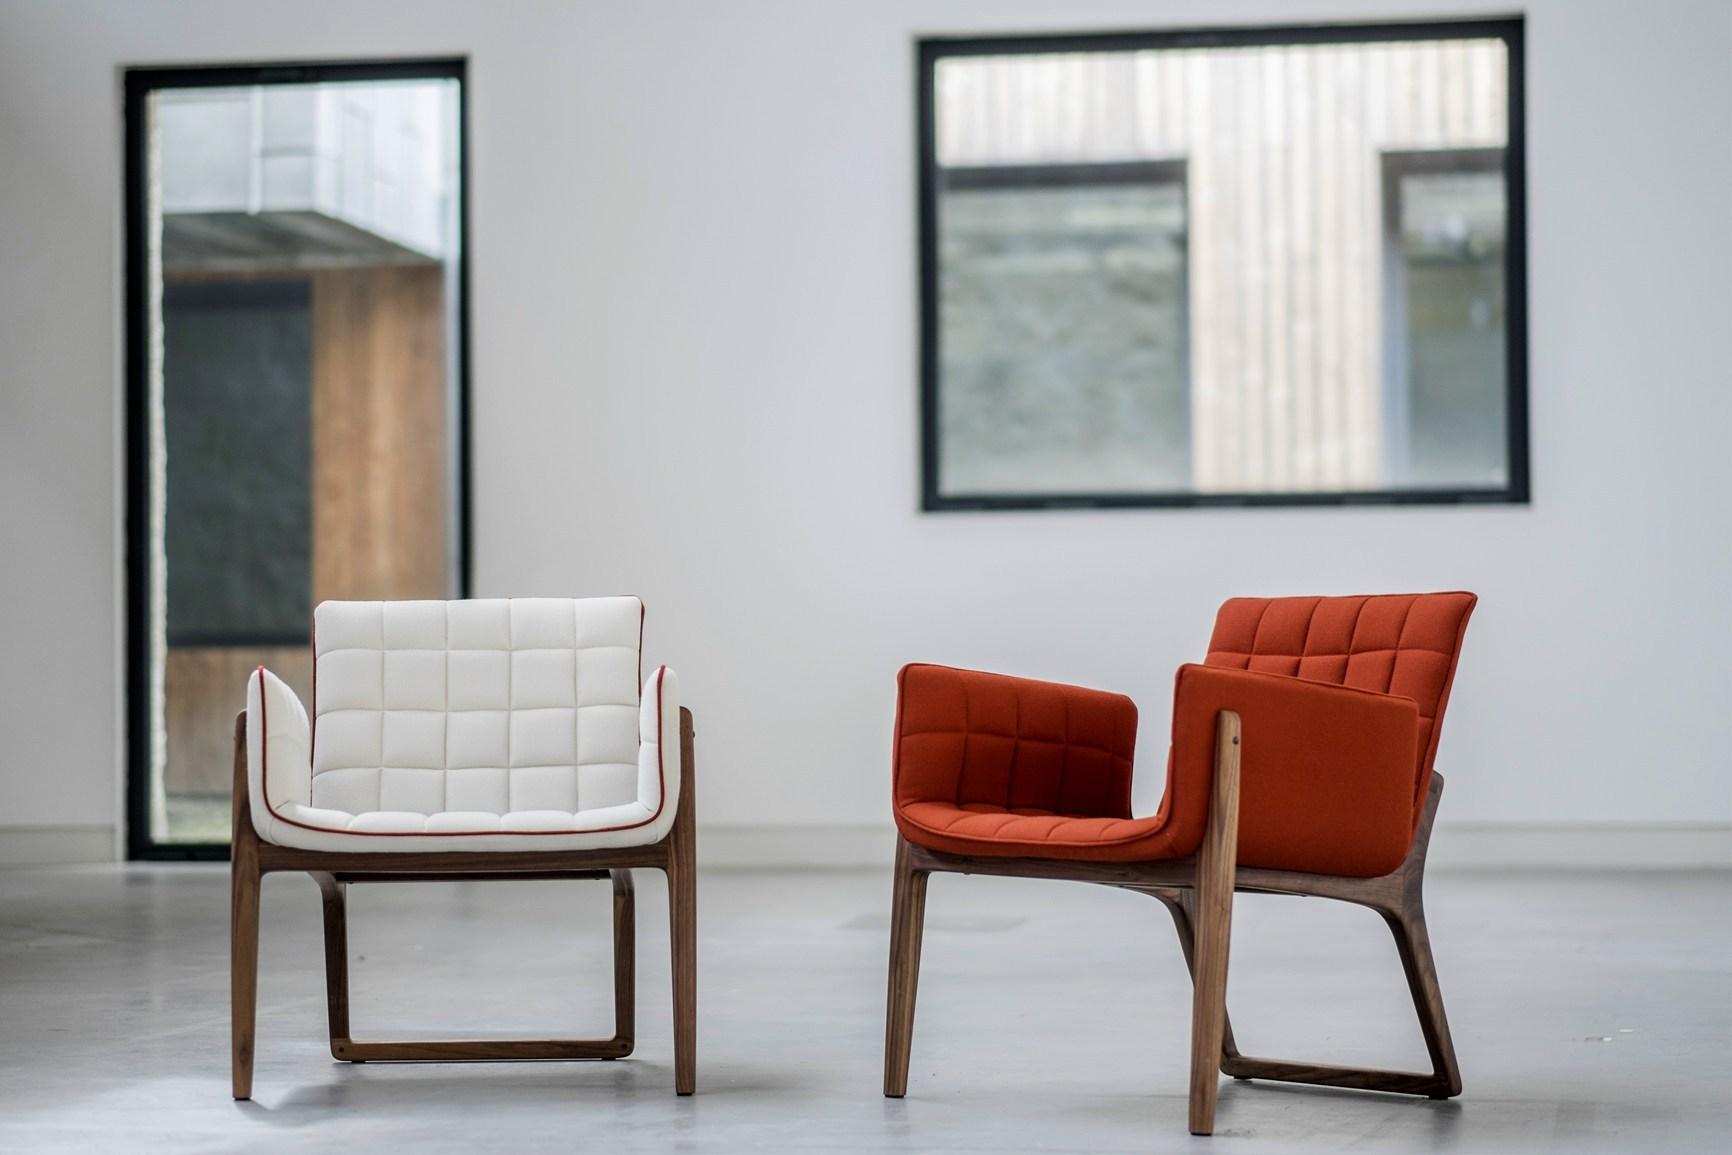 Mandarine Armchairs by Claudia & Harry Washington for Two.Six